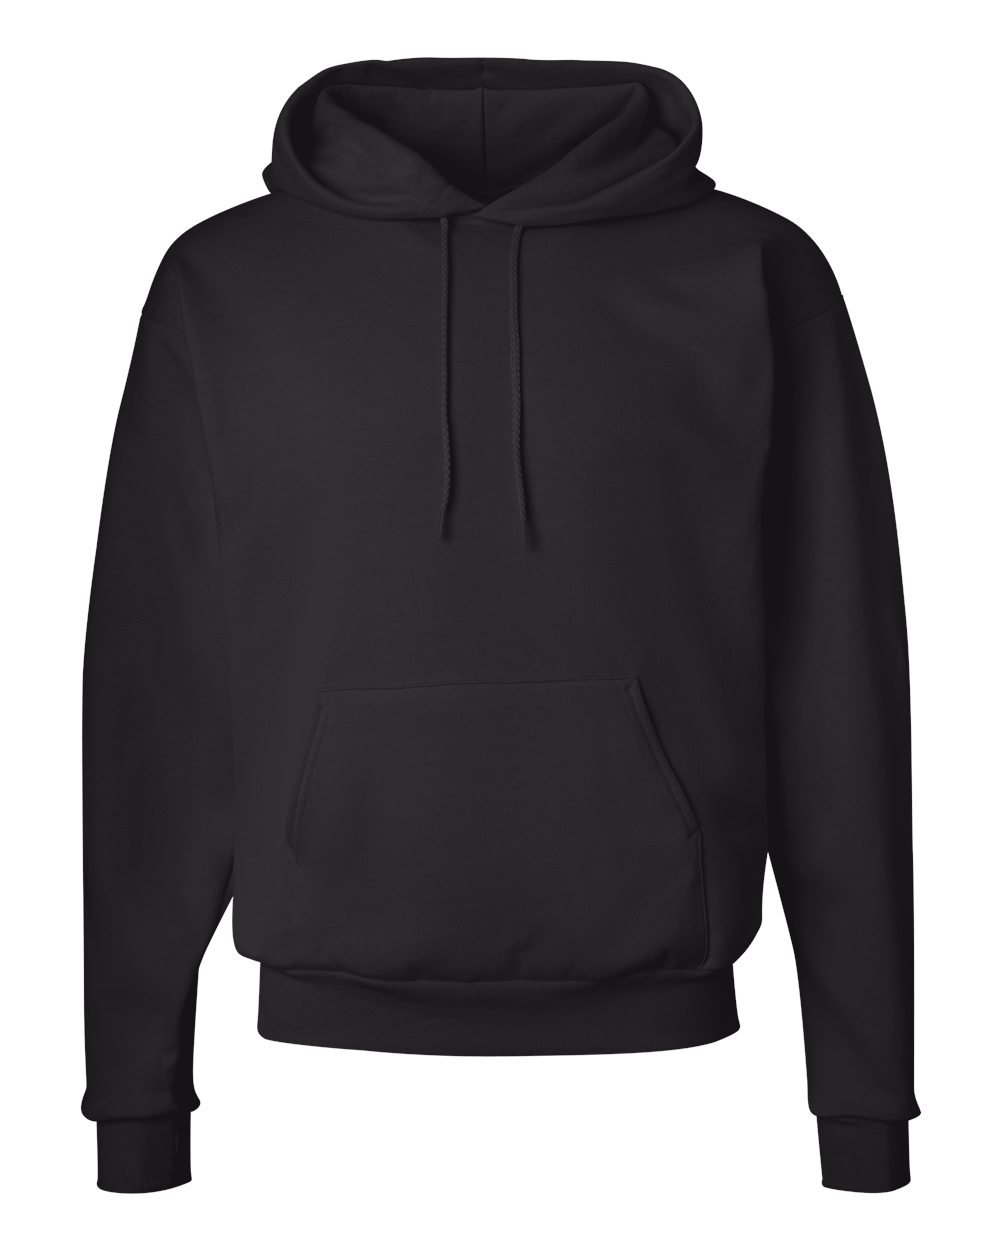 Hanes Men's Pullover EcoSmart Fleece Hoodie, Black, X-Large by Hanes (Image #2)